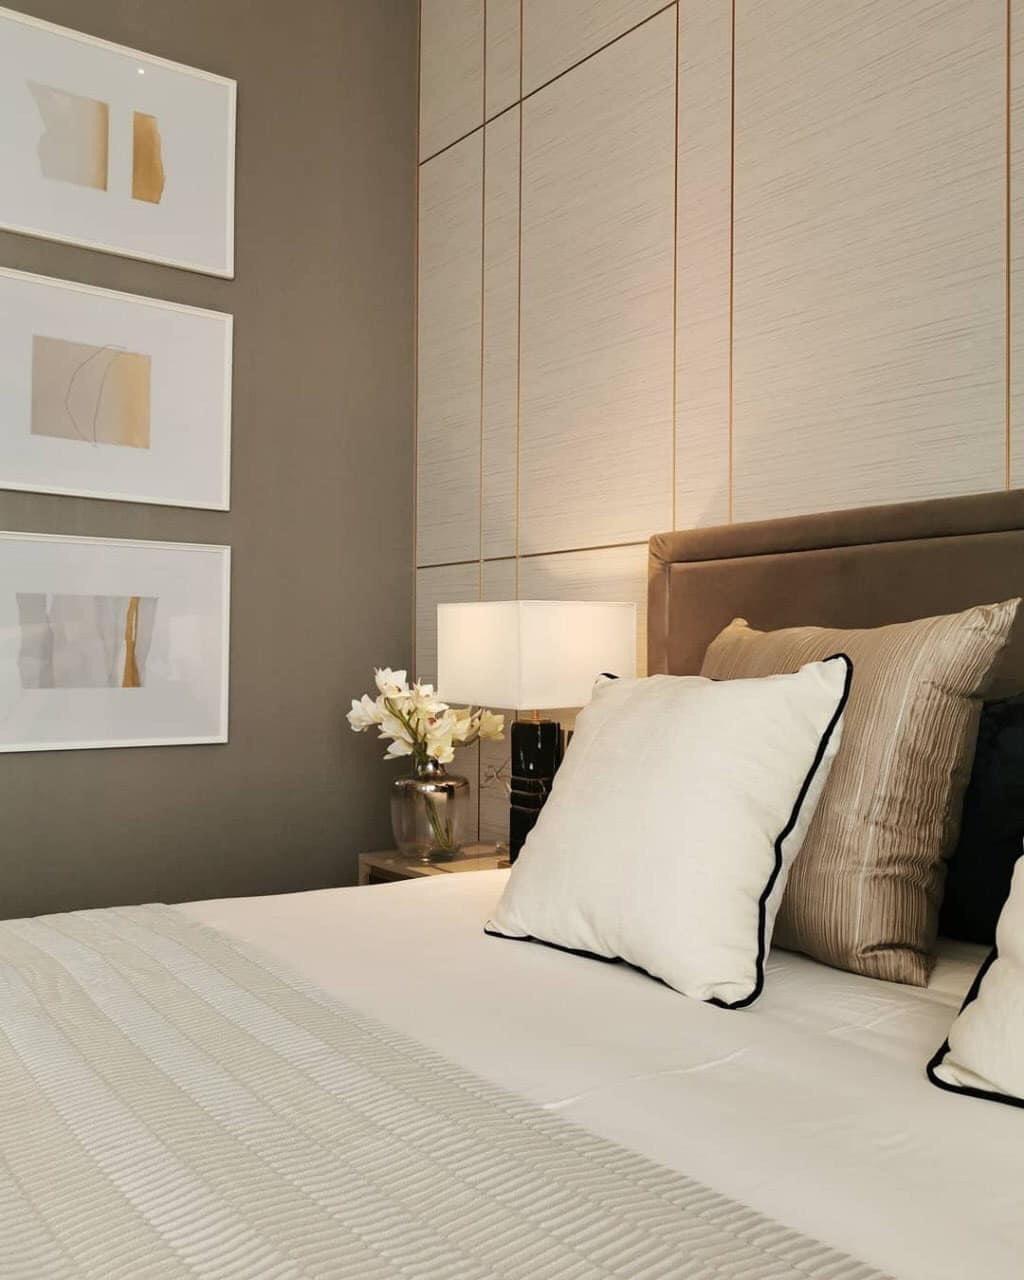 Magnolias Waterfront Residenced IconSiam for Rent – BTS Krung Thon Buri – Unit 60.59 Sq.m.